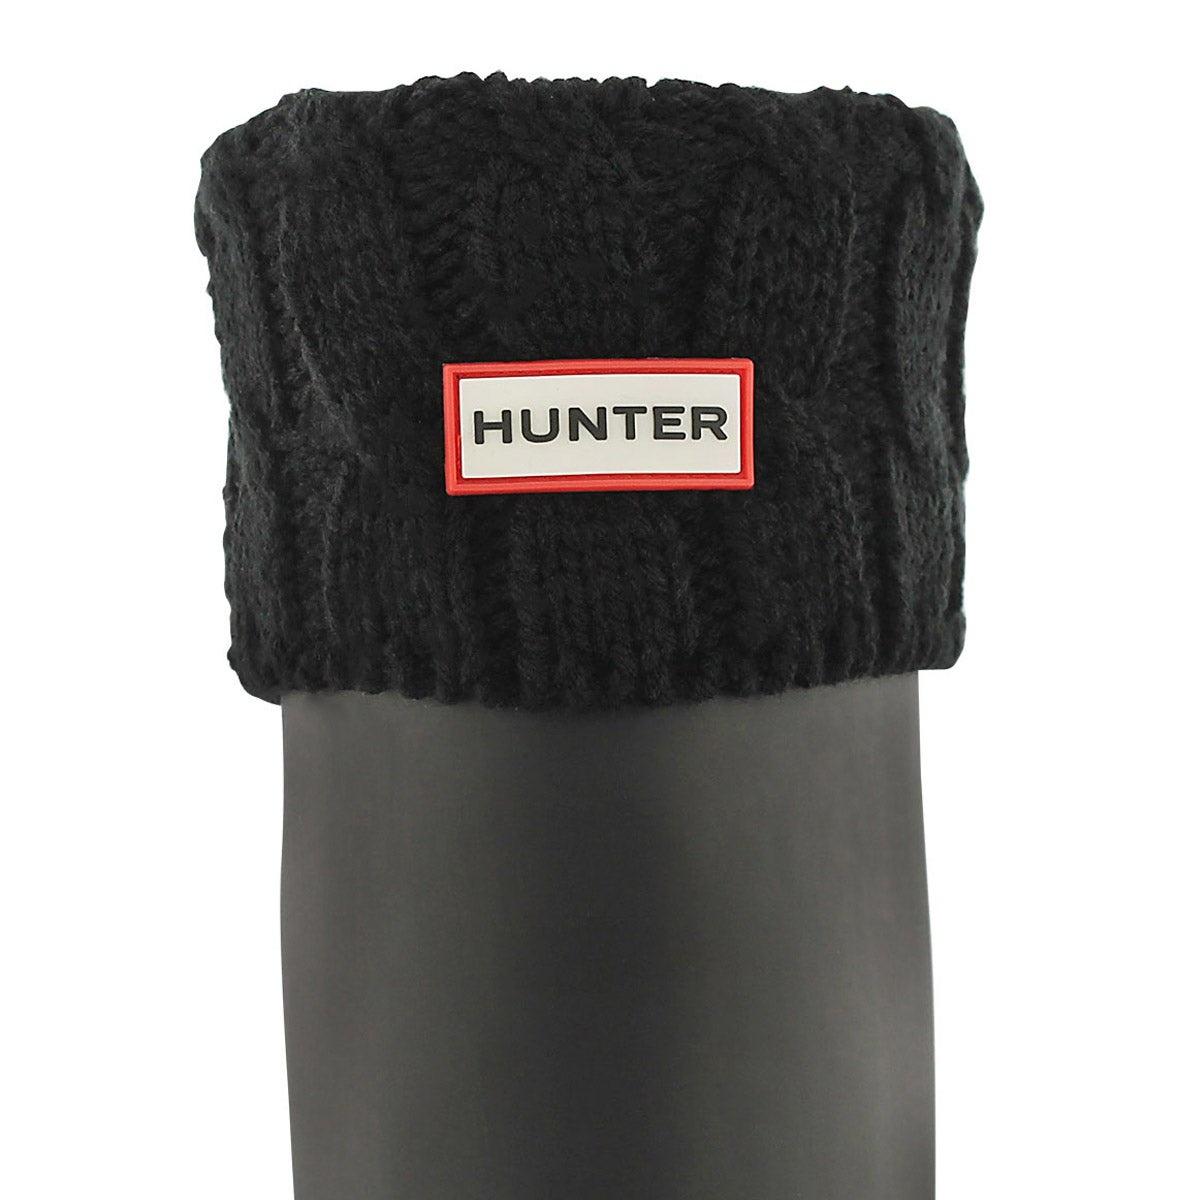 HUNTER 6 STICH CABLE SOCKS TALL